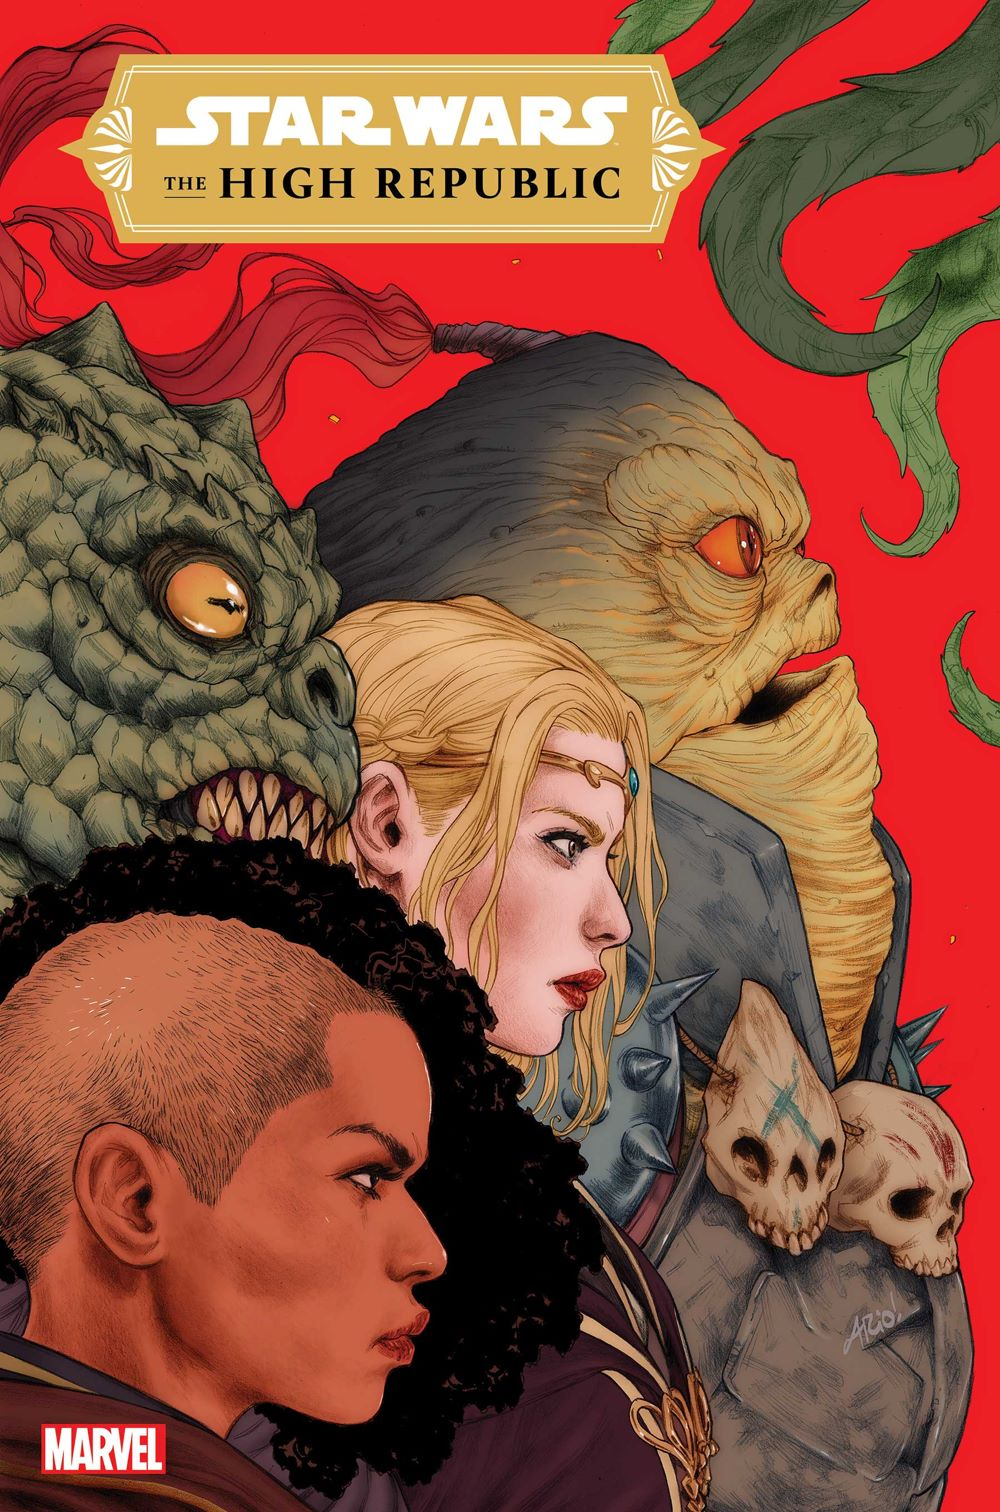 STWHIGHREP2021008_ARIO Marvel Comics August 2021 Solicitations